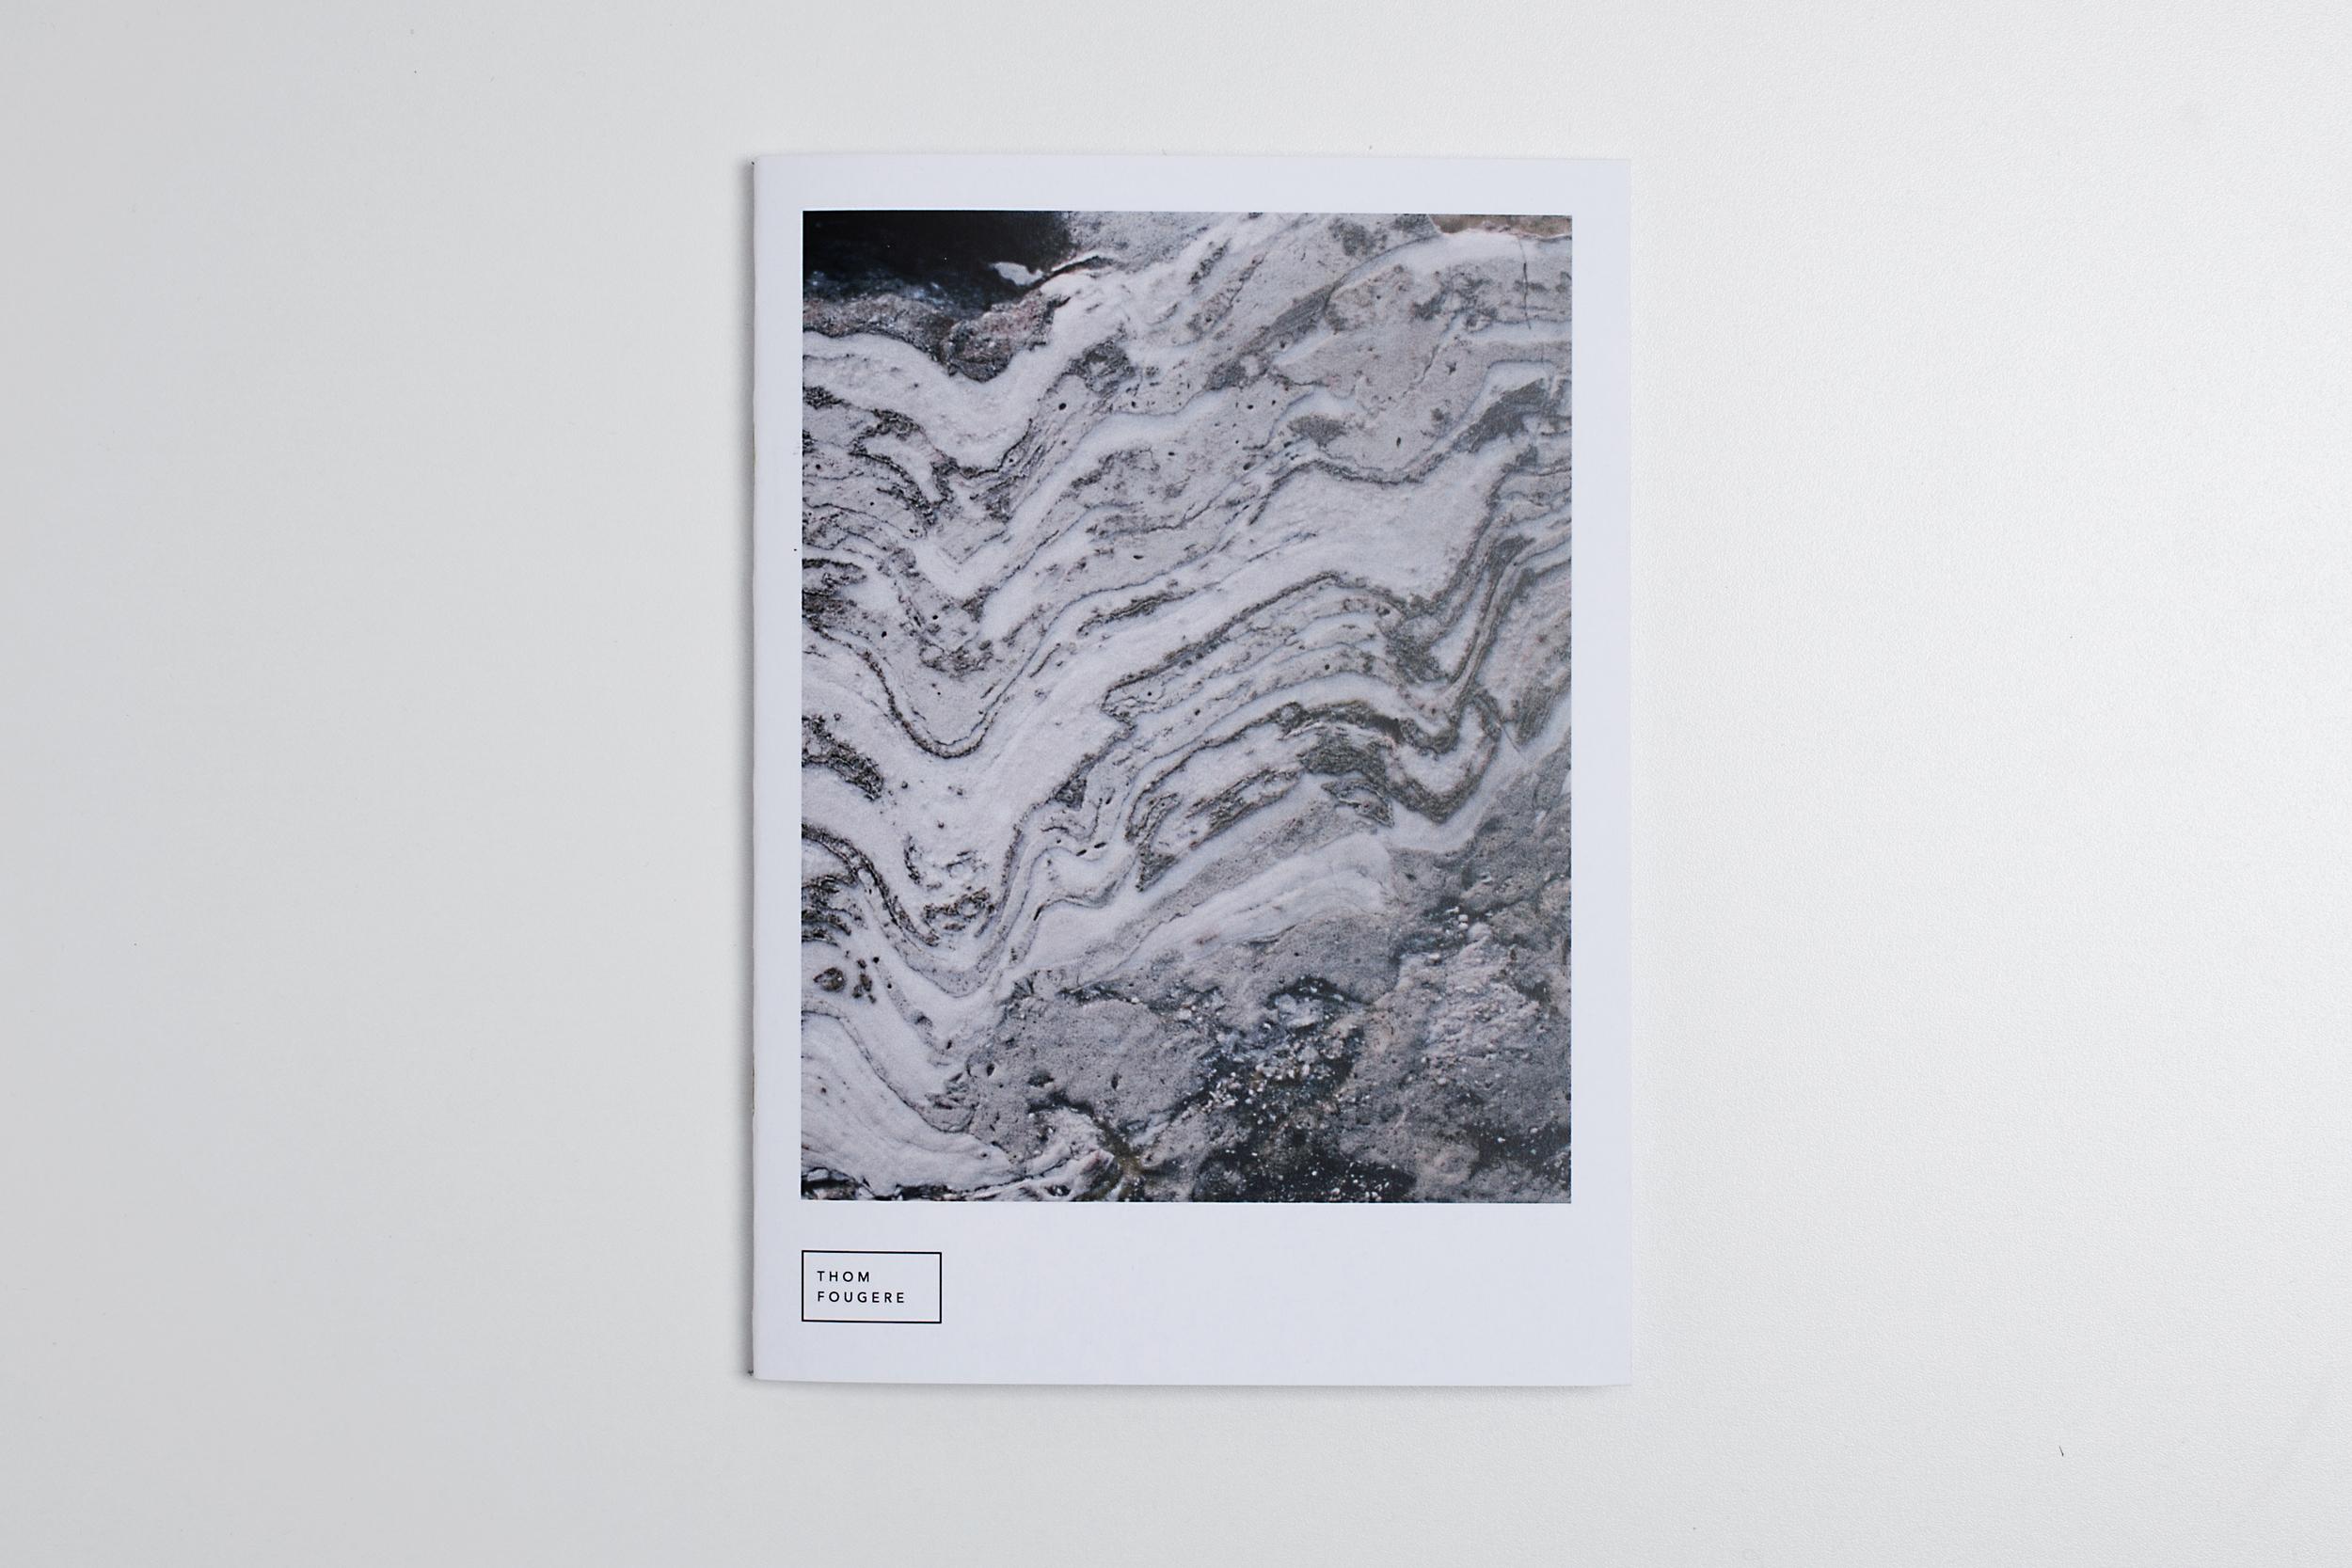 Thom Fougere Catalogue 2013